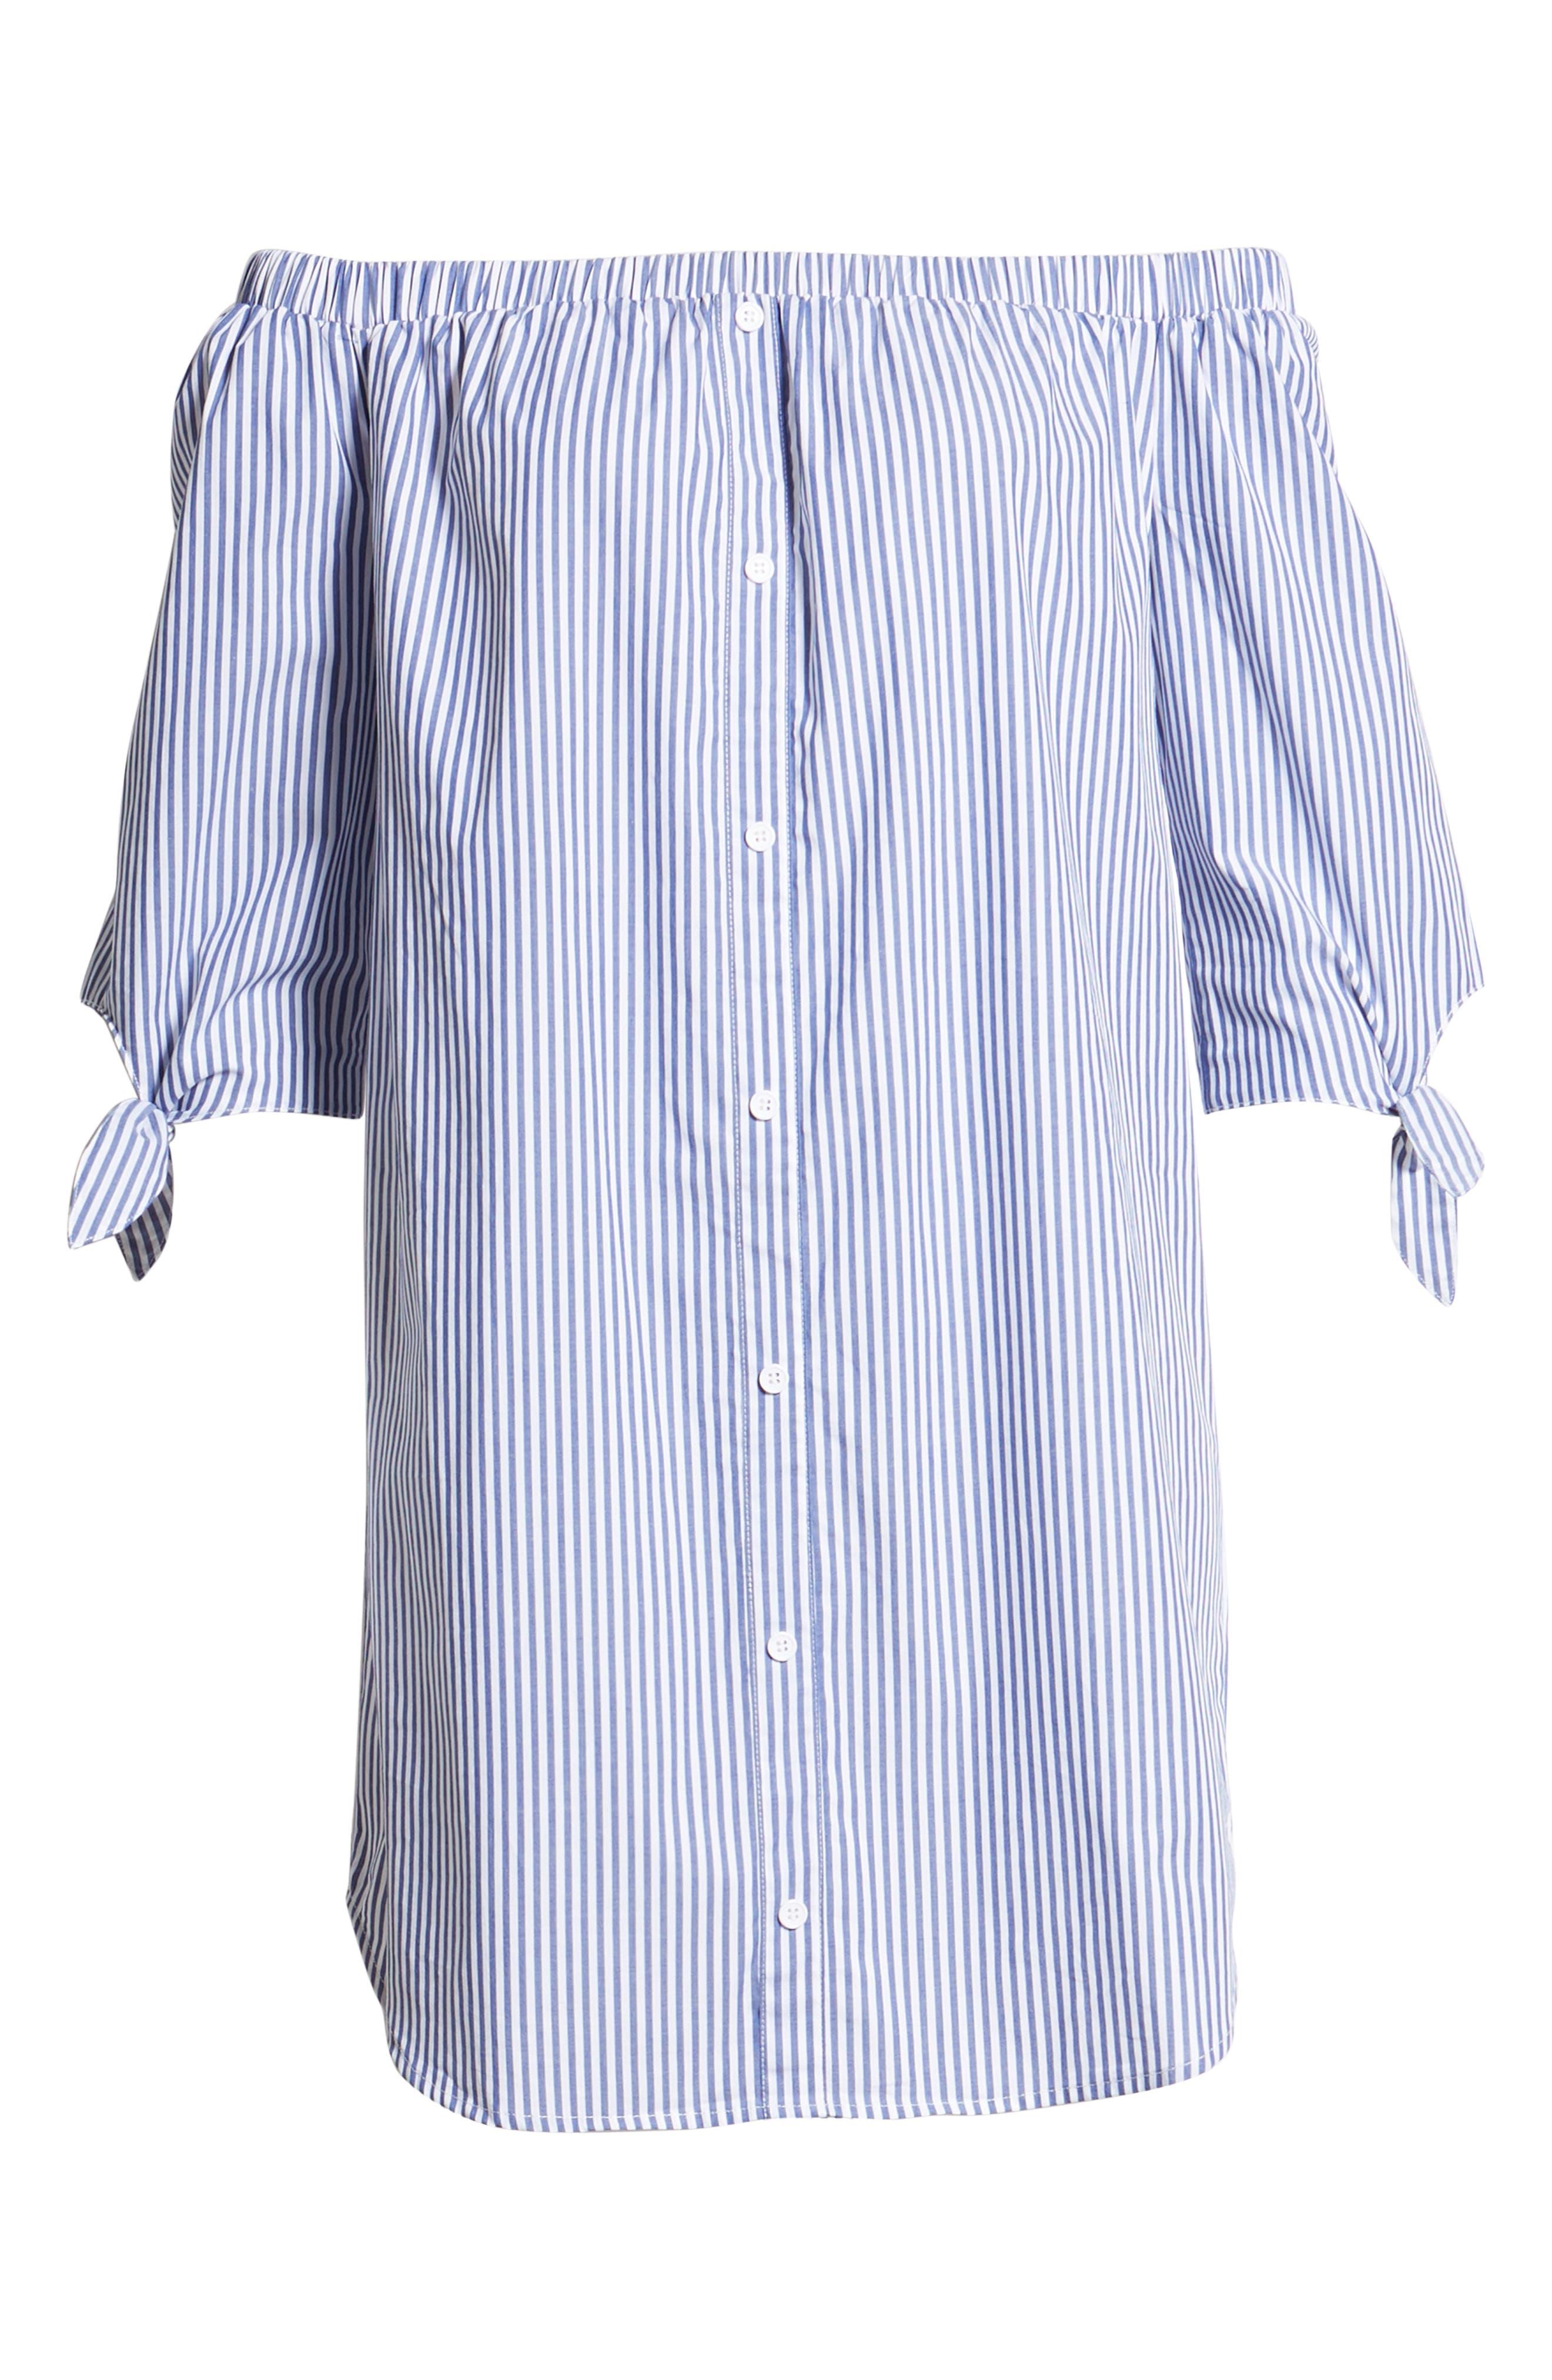 Stripe Off-the-shoulder Poplin Shirtdress,                             Alternate thumbnail 7, color,                             400